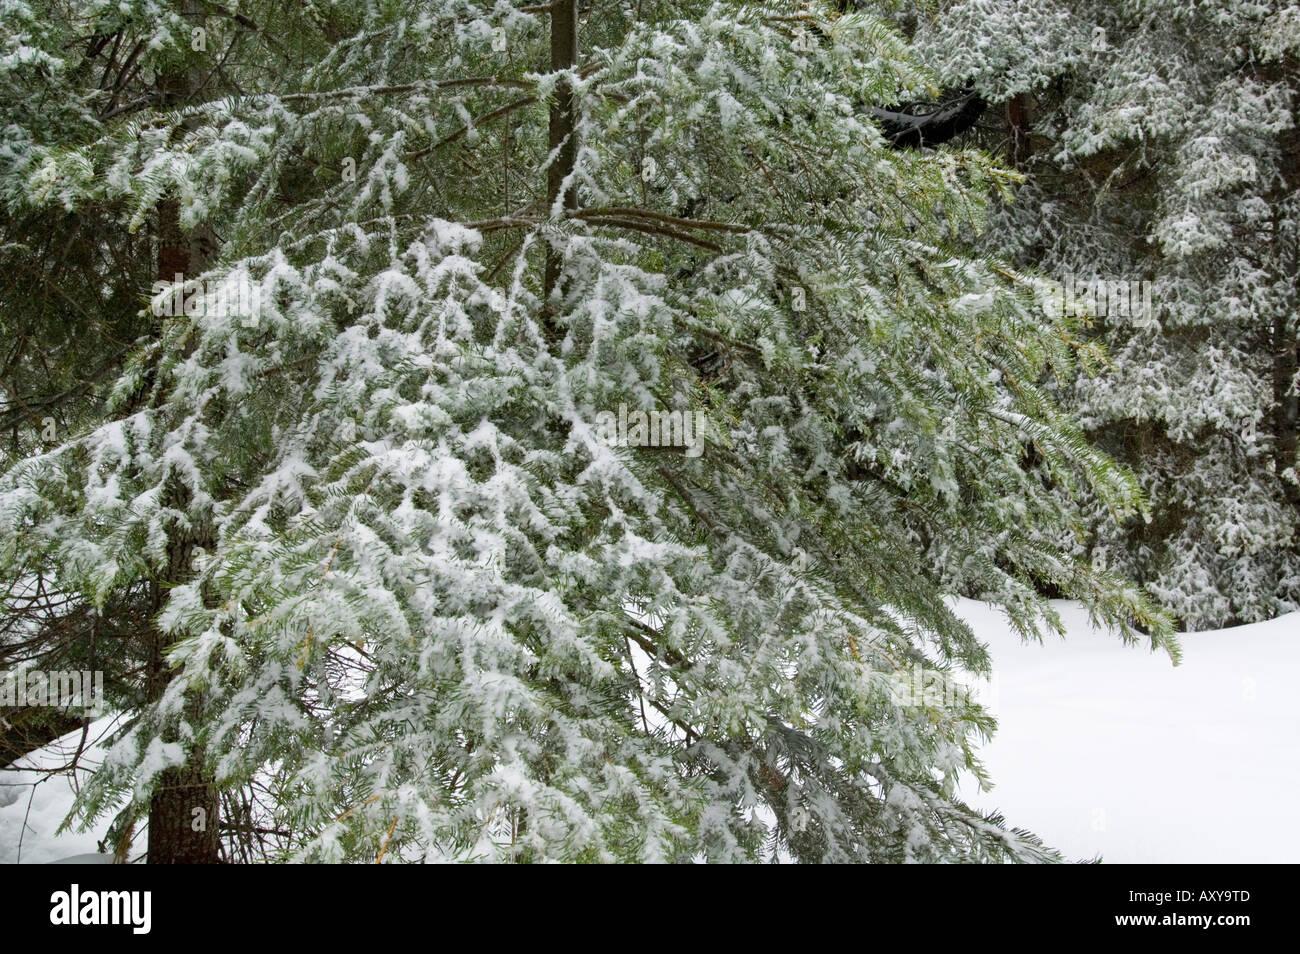 Fresh winter snow on young Fir trees at Crane Flat Yosemite National Park California - Stock Image